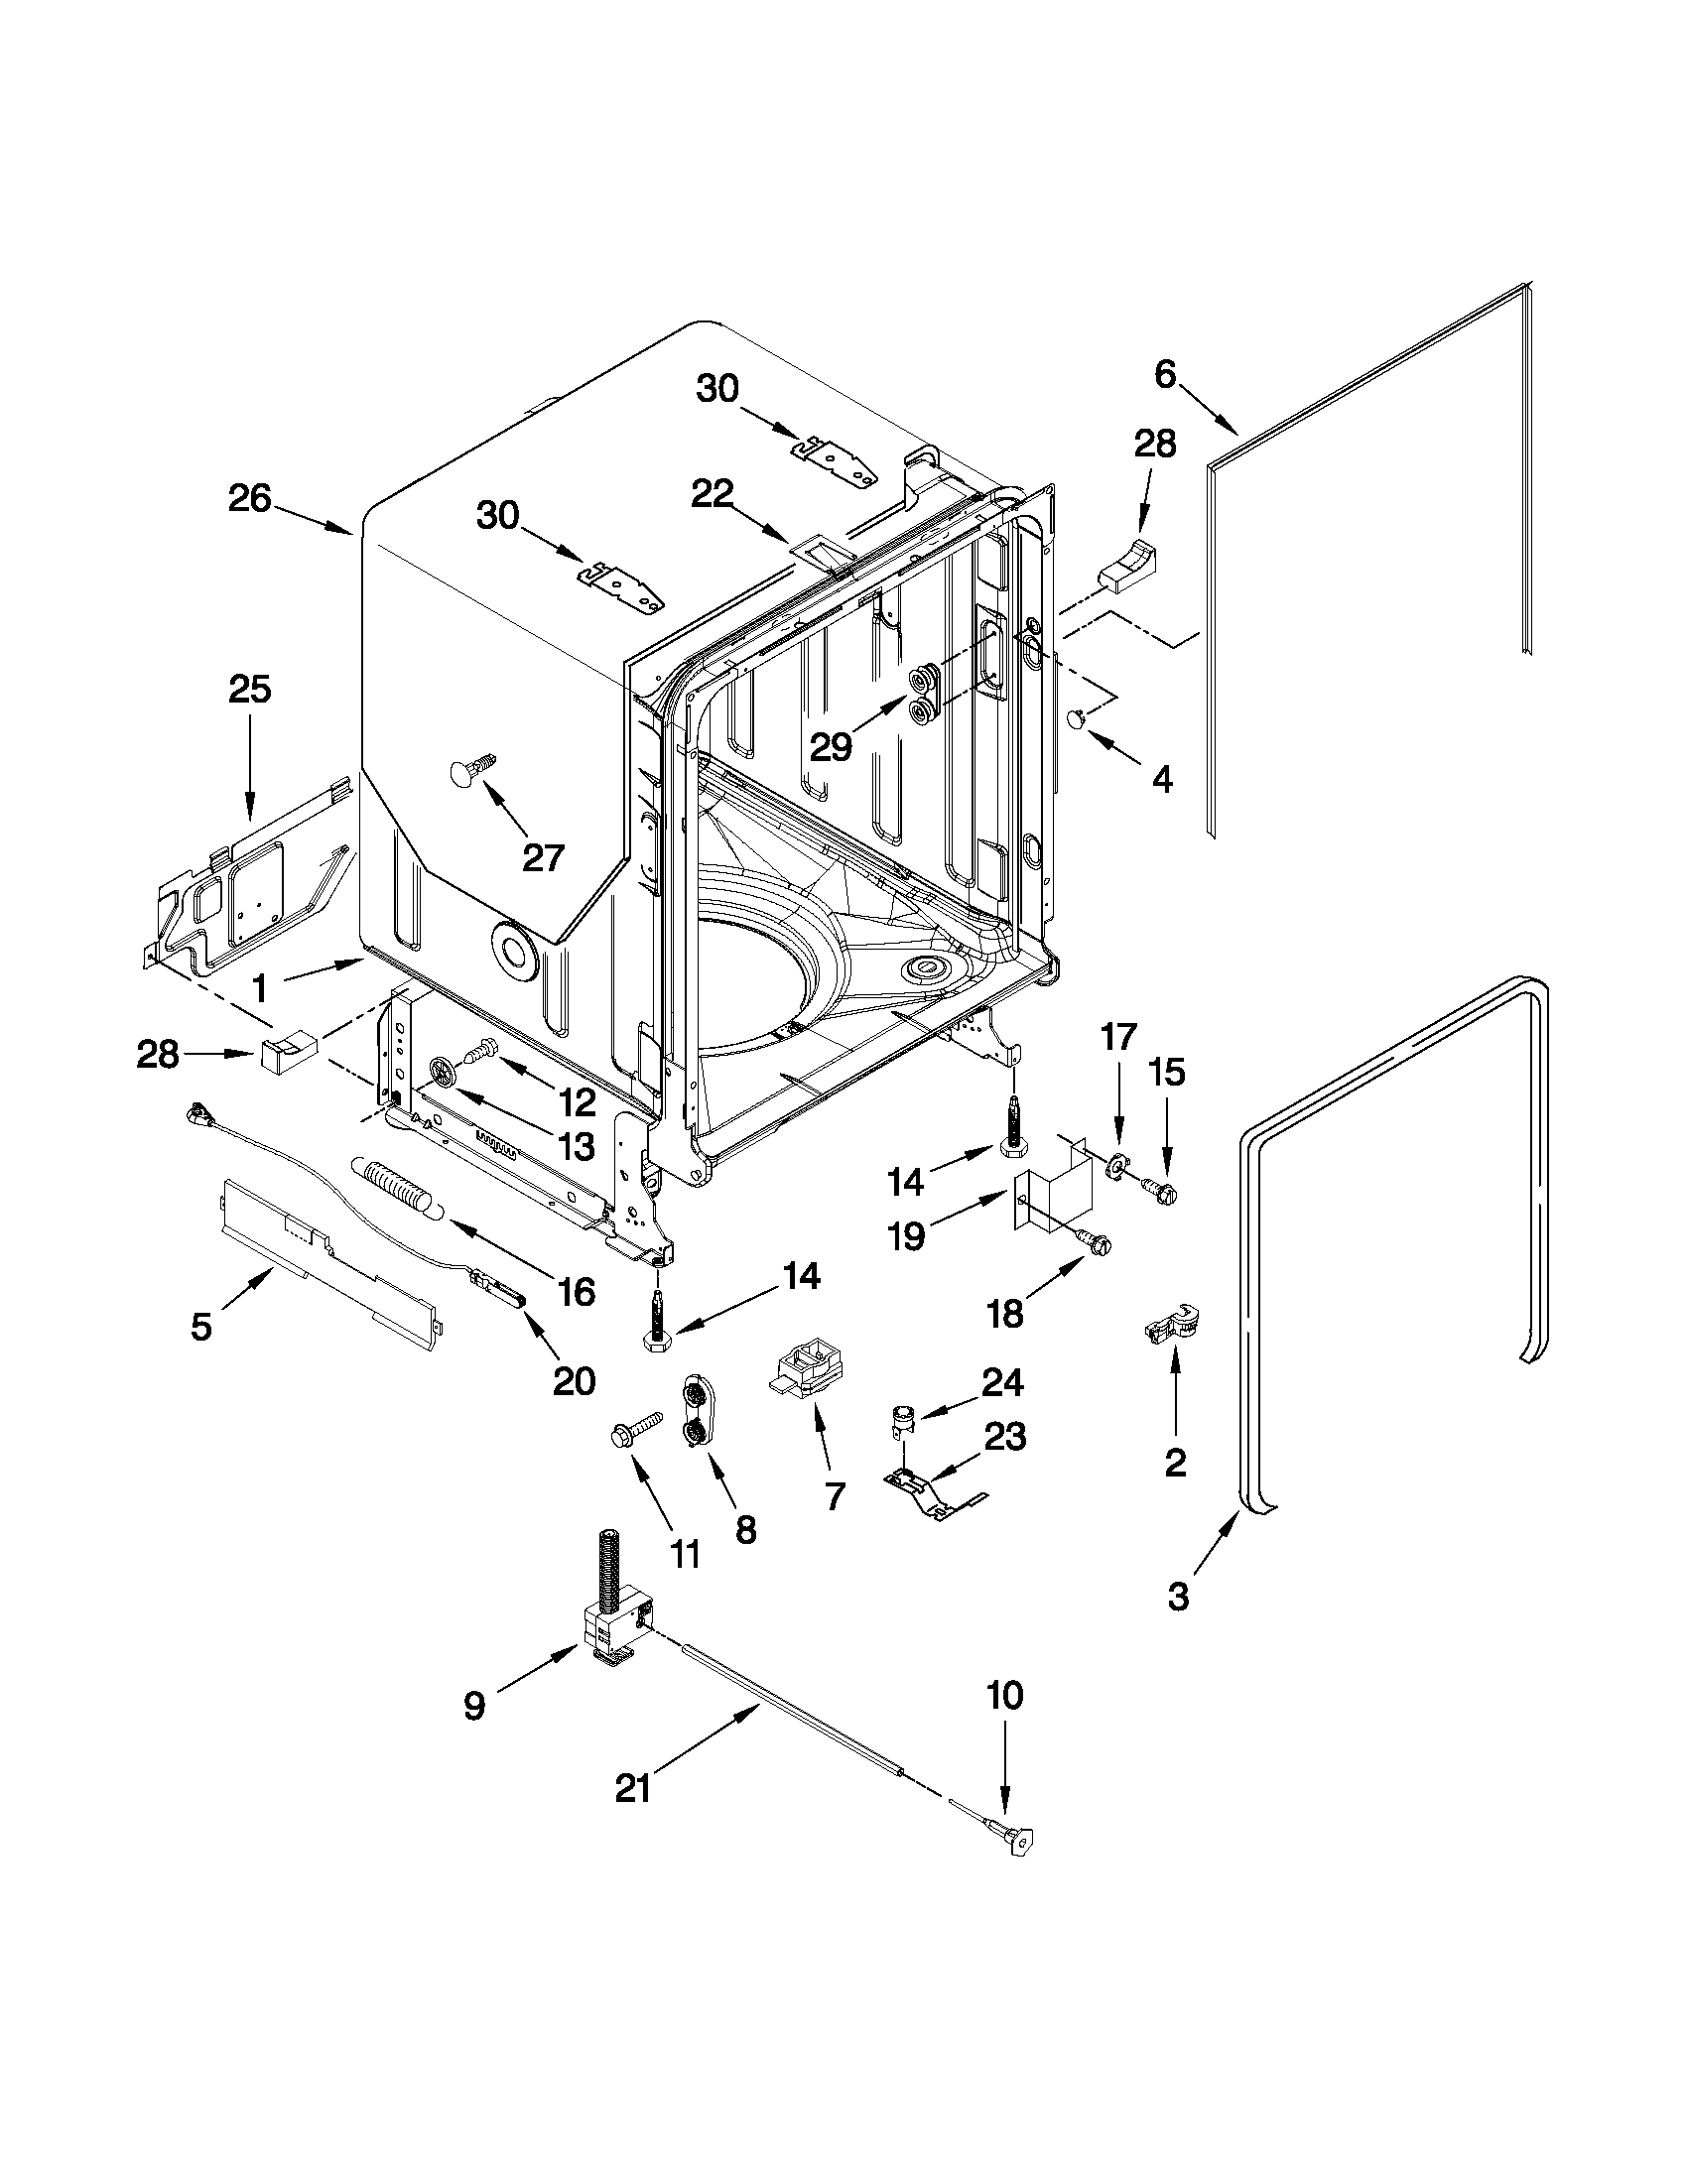 kenmore elite dishwasher wiring diagram vfd undercounter parts model